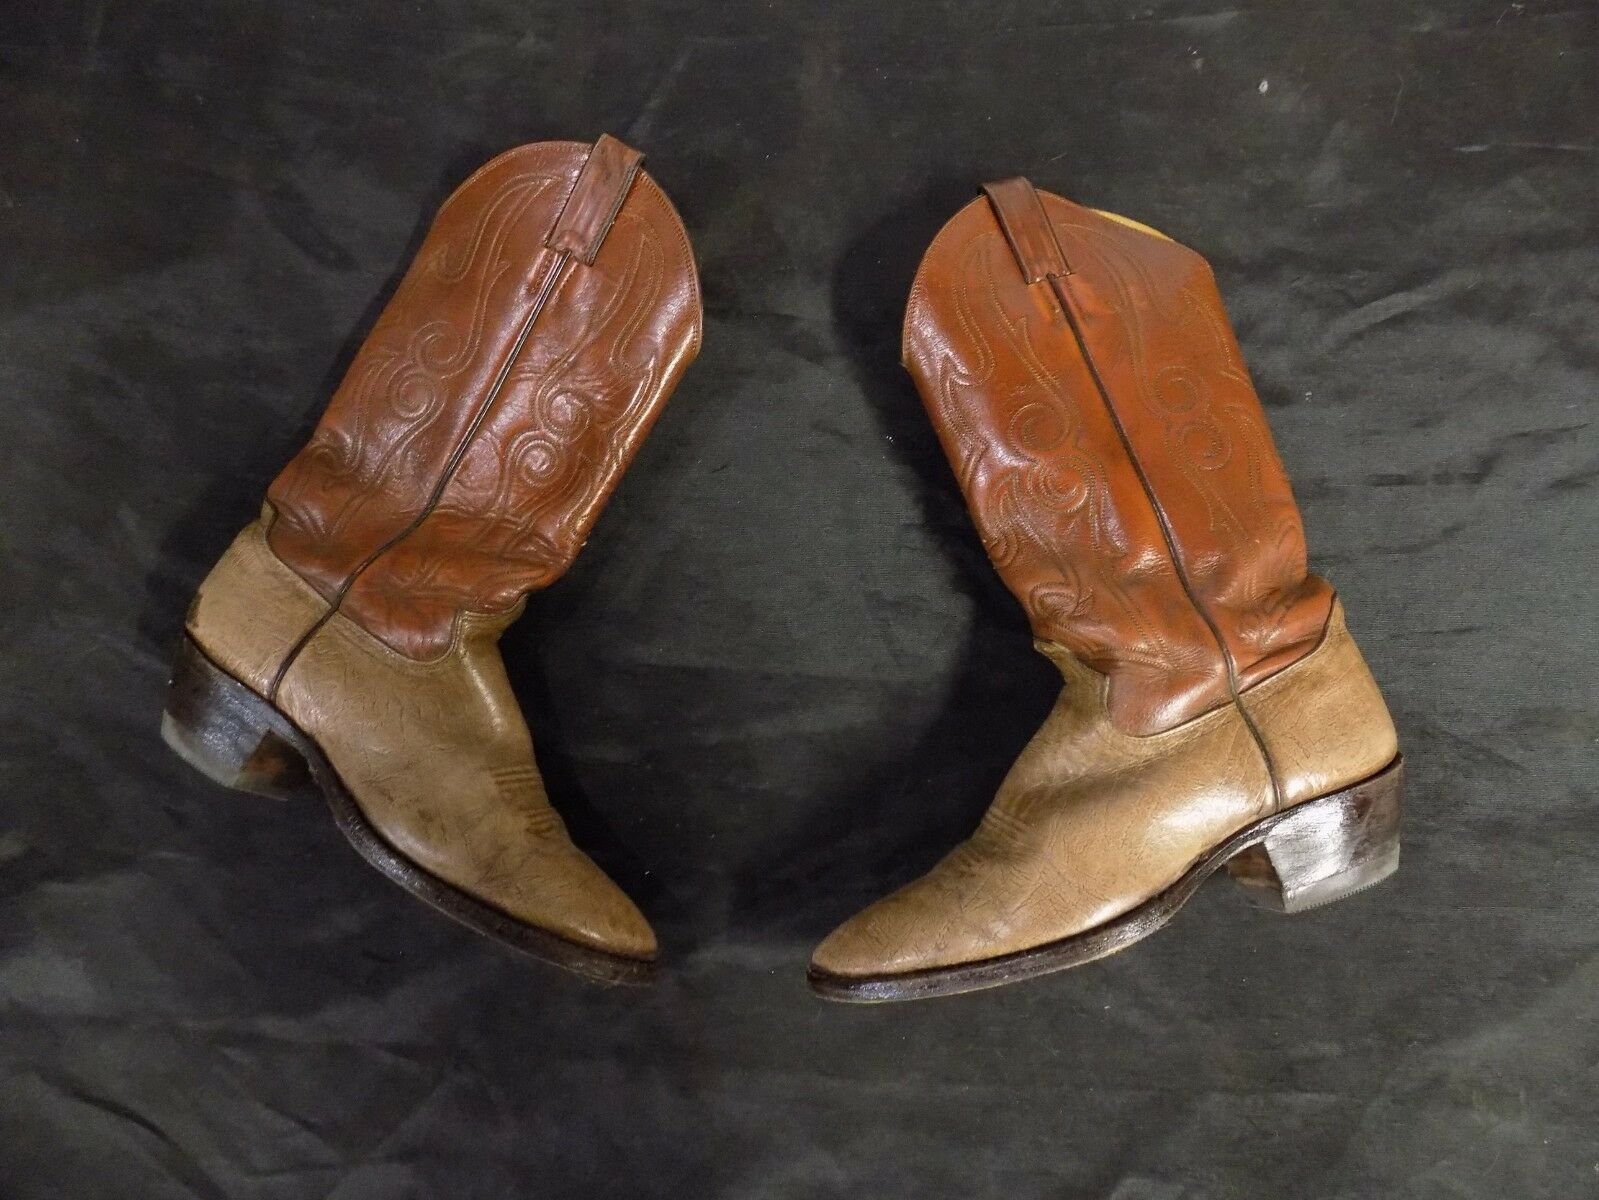 COMB última botas de vaquero un dueño comprado D Justin estilo J 5412 V 5833